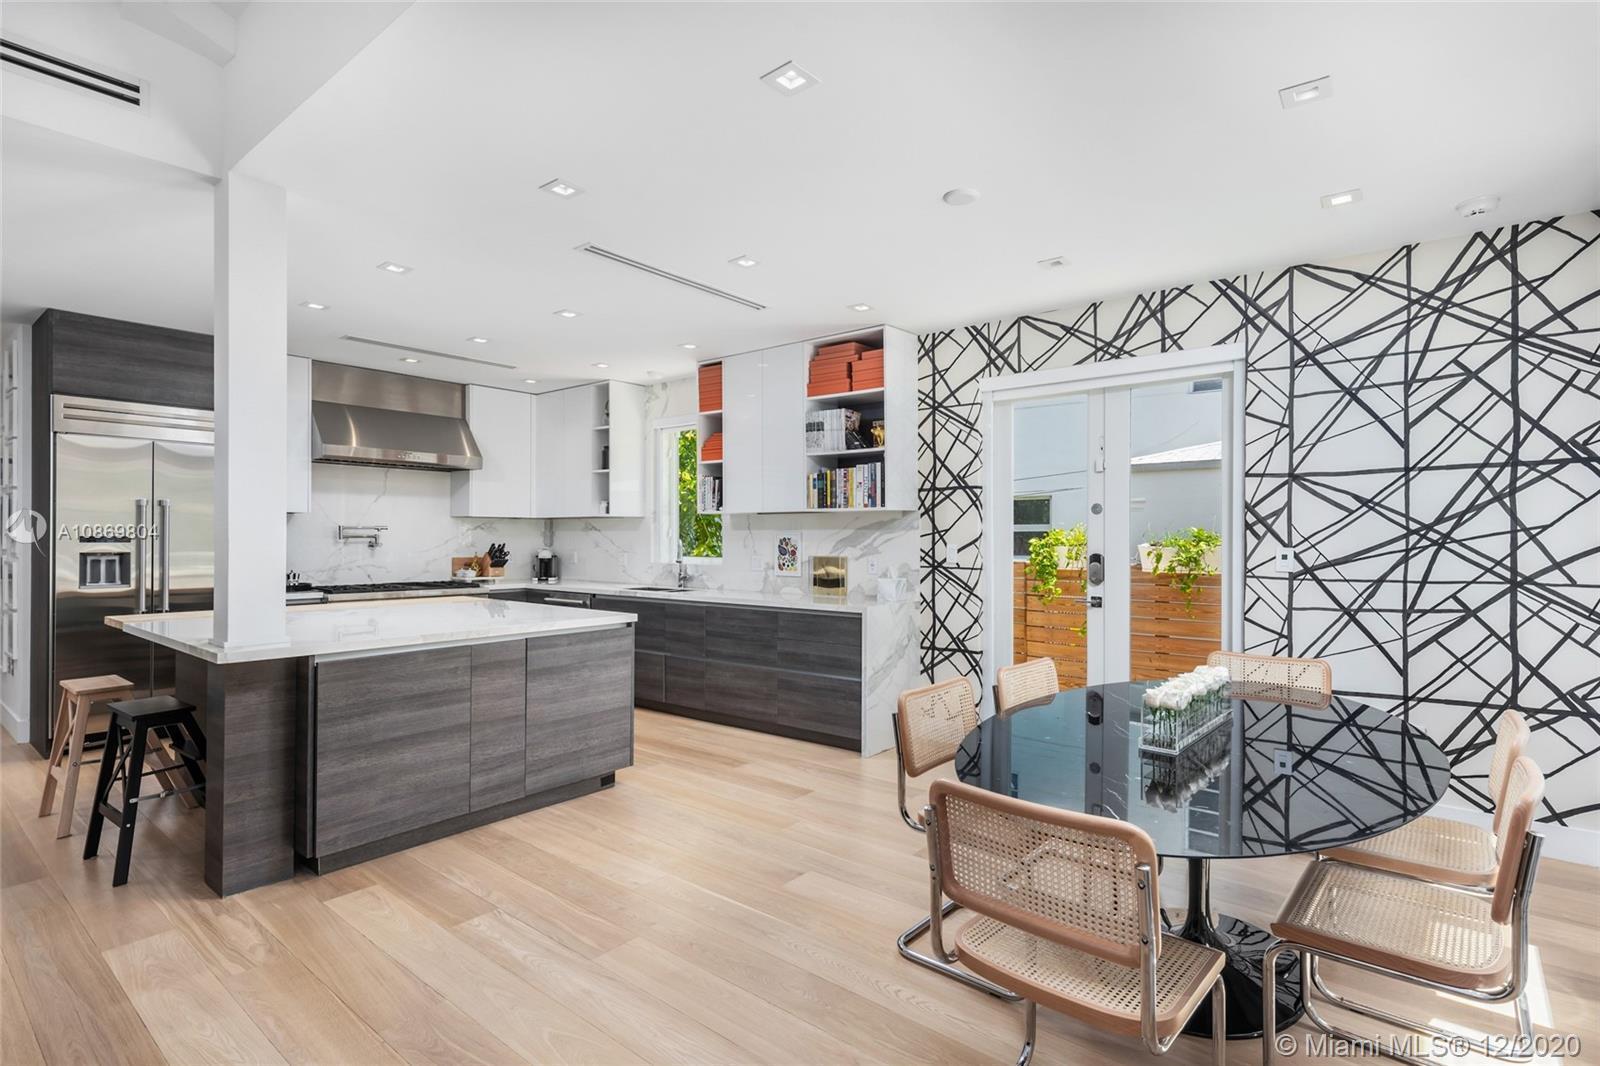 Newly built Miami Beach home w/3 beds, a den, & 2.5 baths. Custom designed residence offers an open